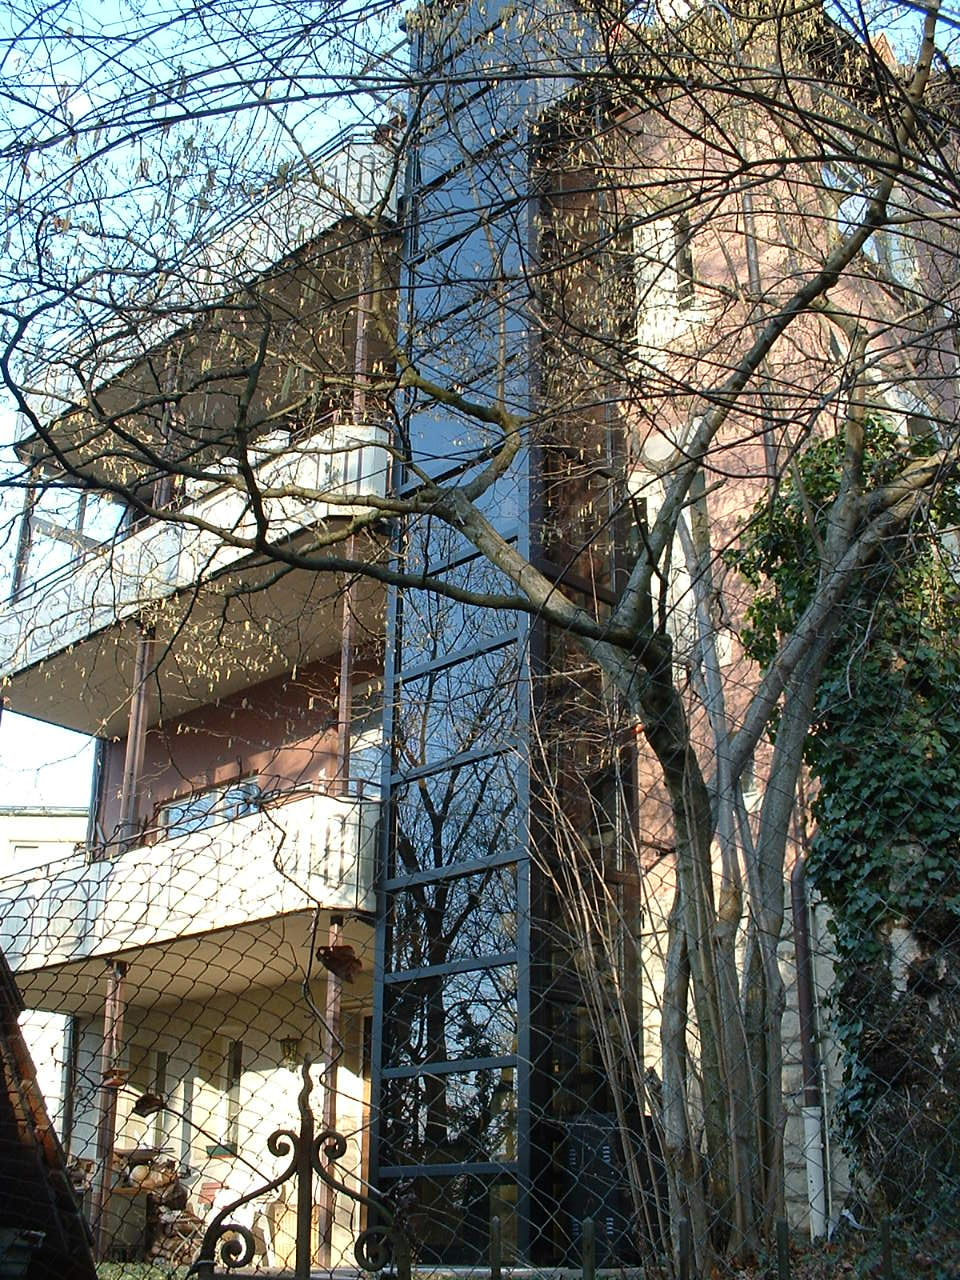 Außenaufzug aus Glas an mehrstöckigem Gebäude